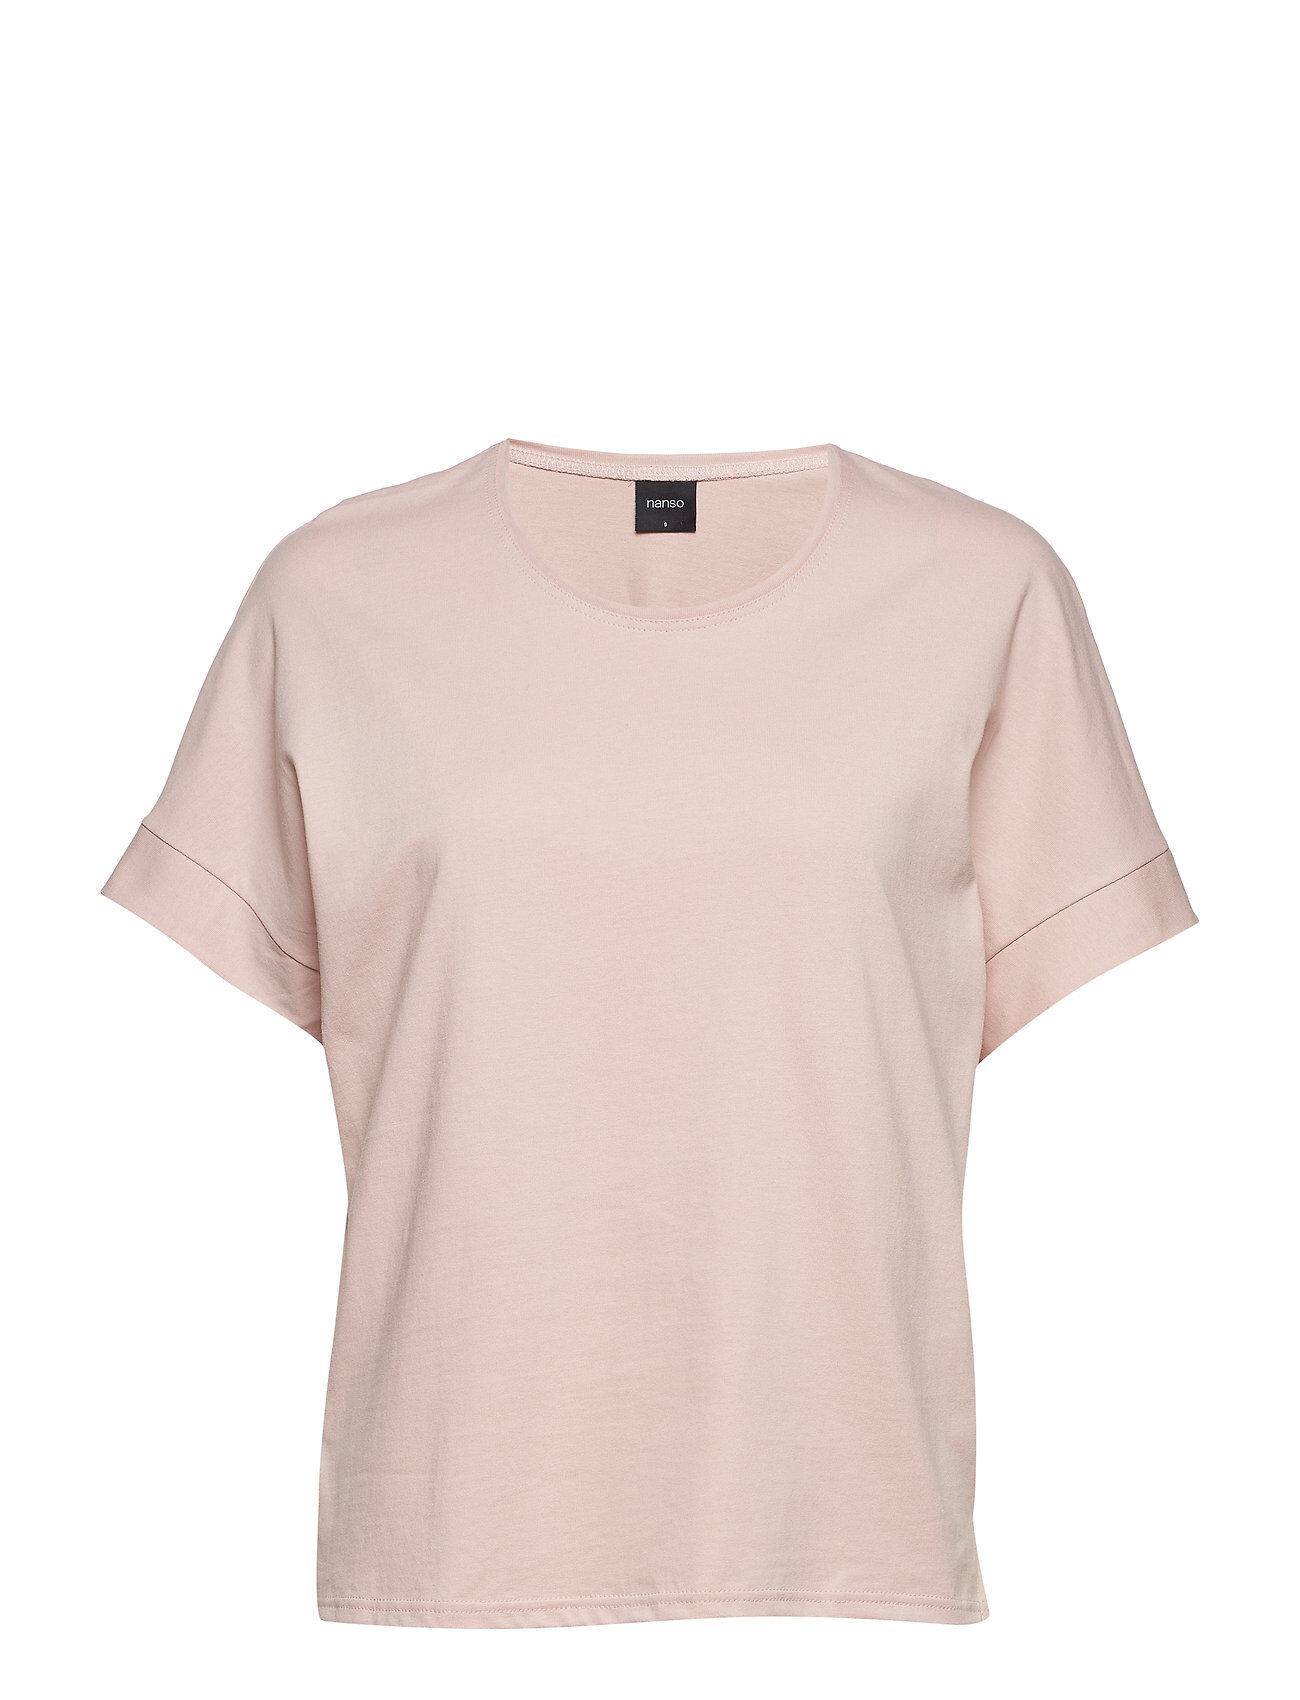 Nanso Ladies Leisure Wear/Shirt, Pilvi